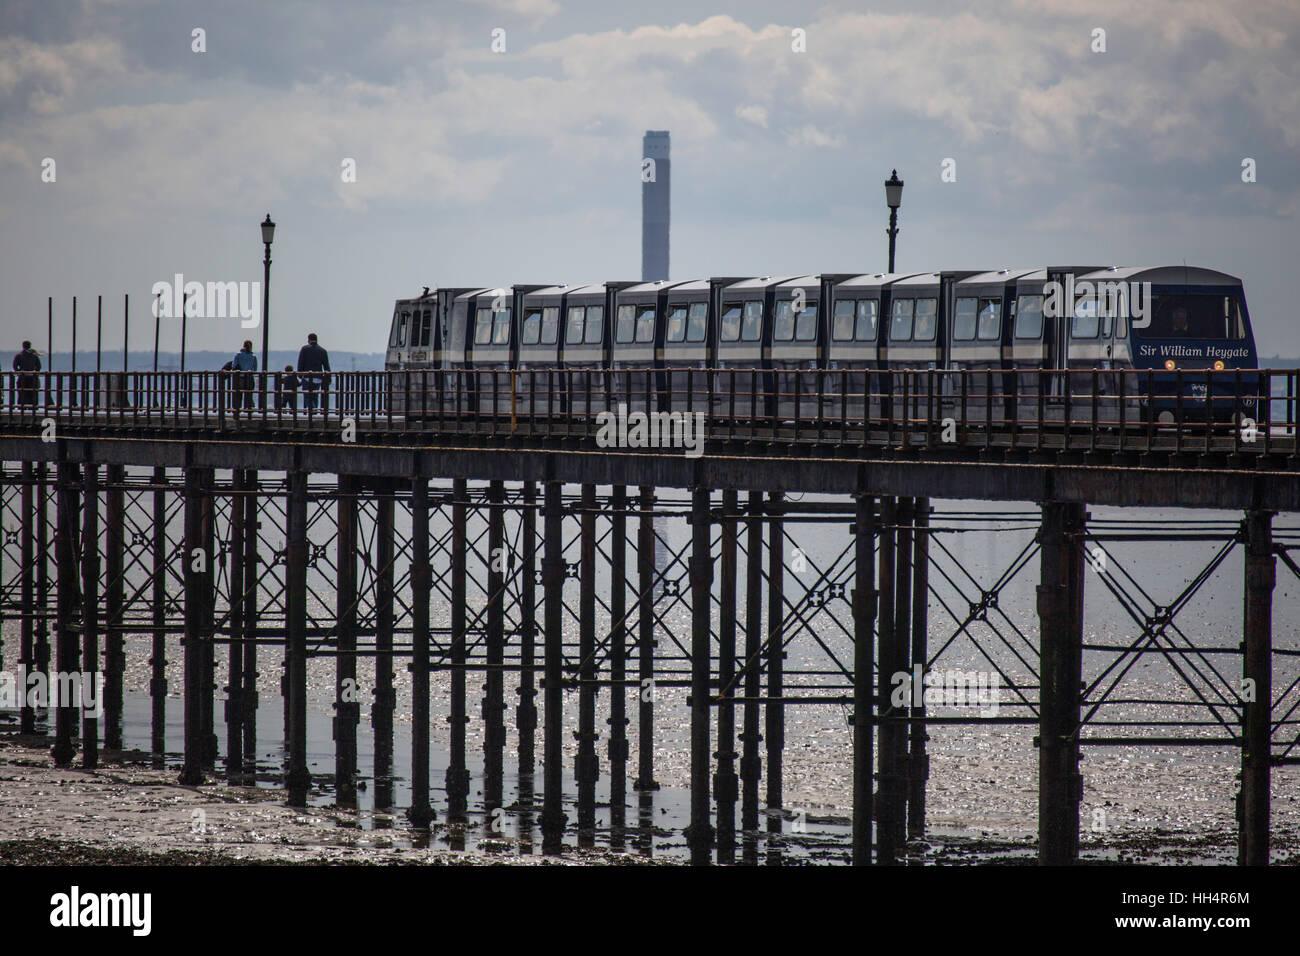 Train on Southend Pier, Southend-on-sea, Essex - Stock Image